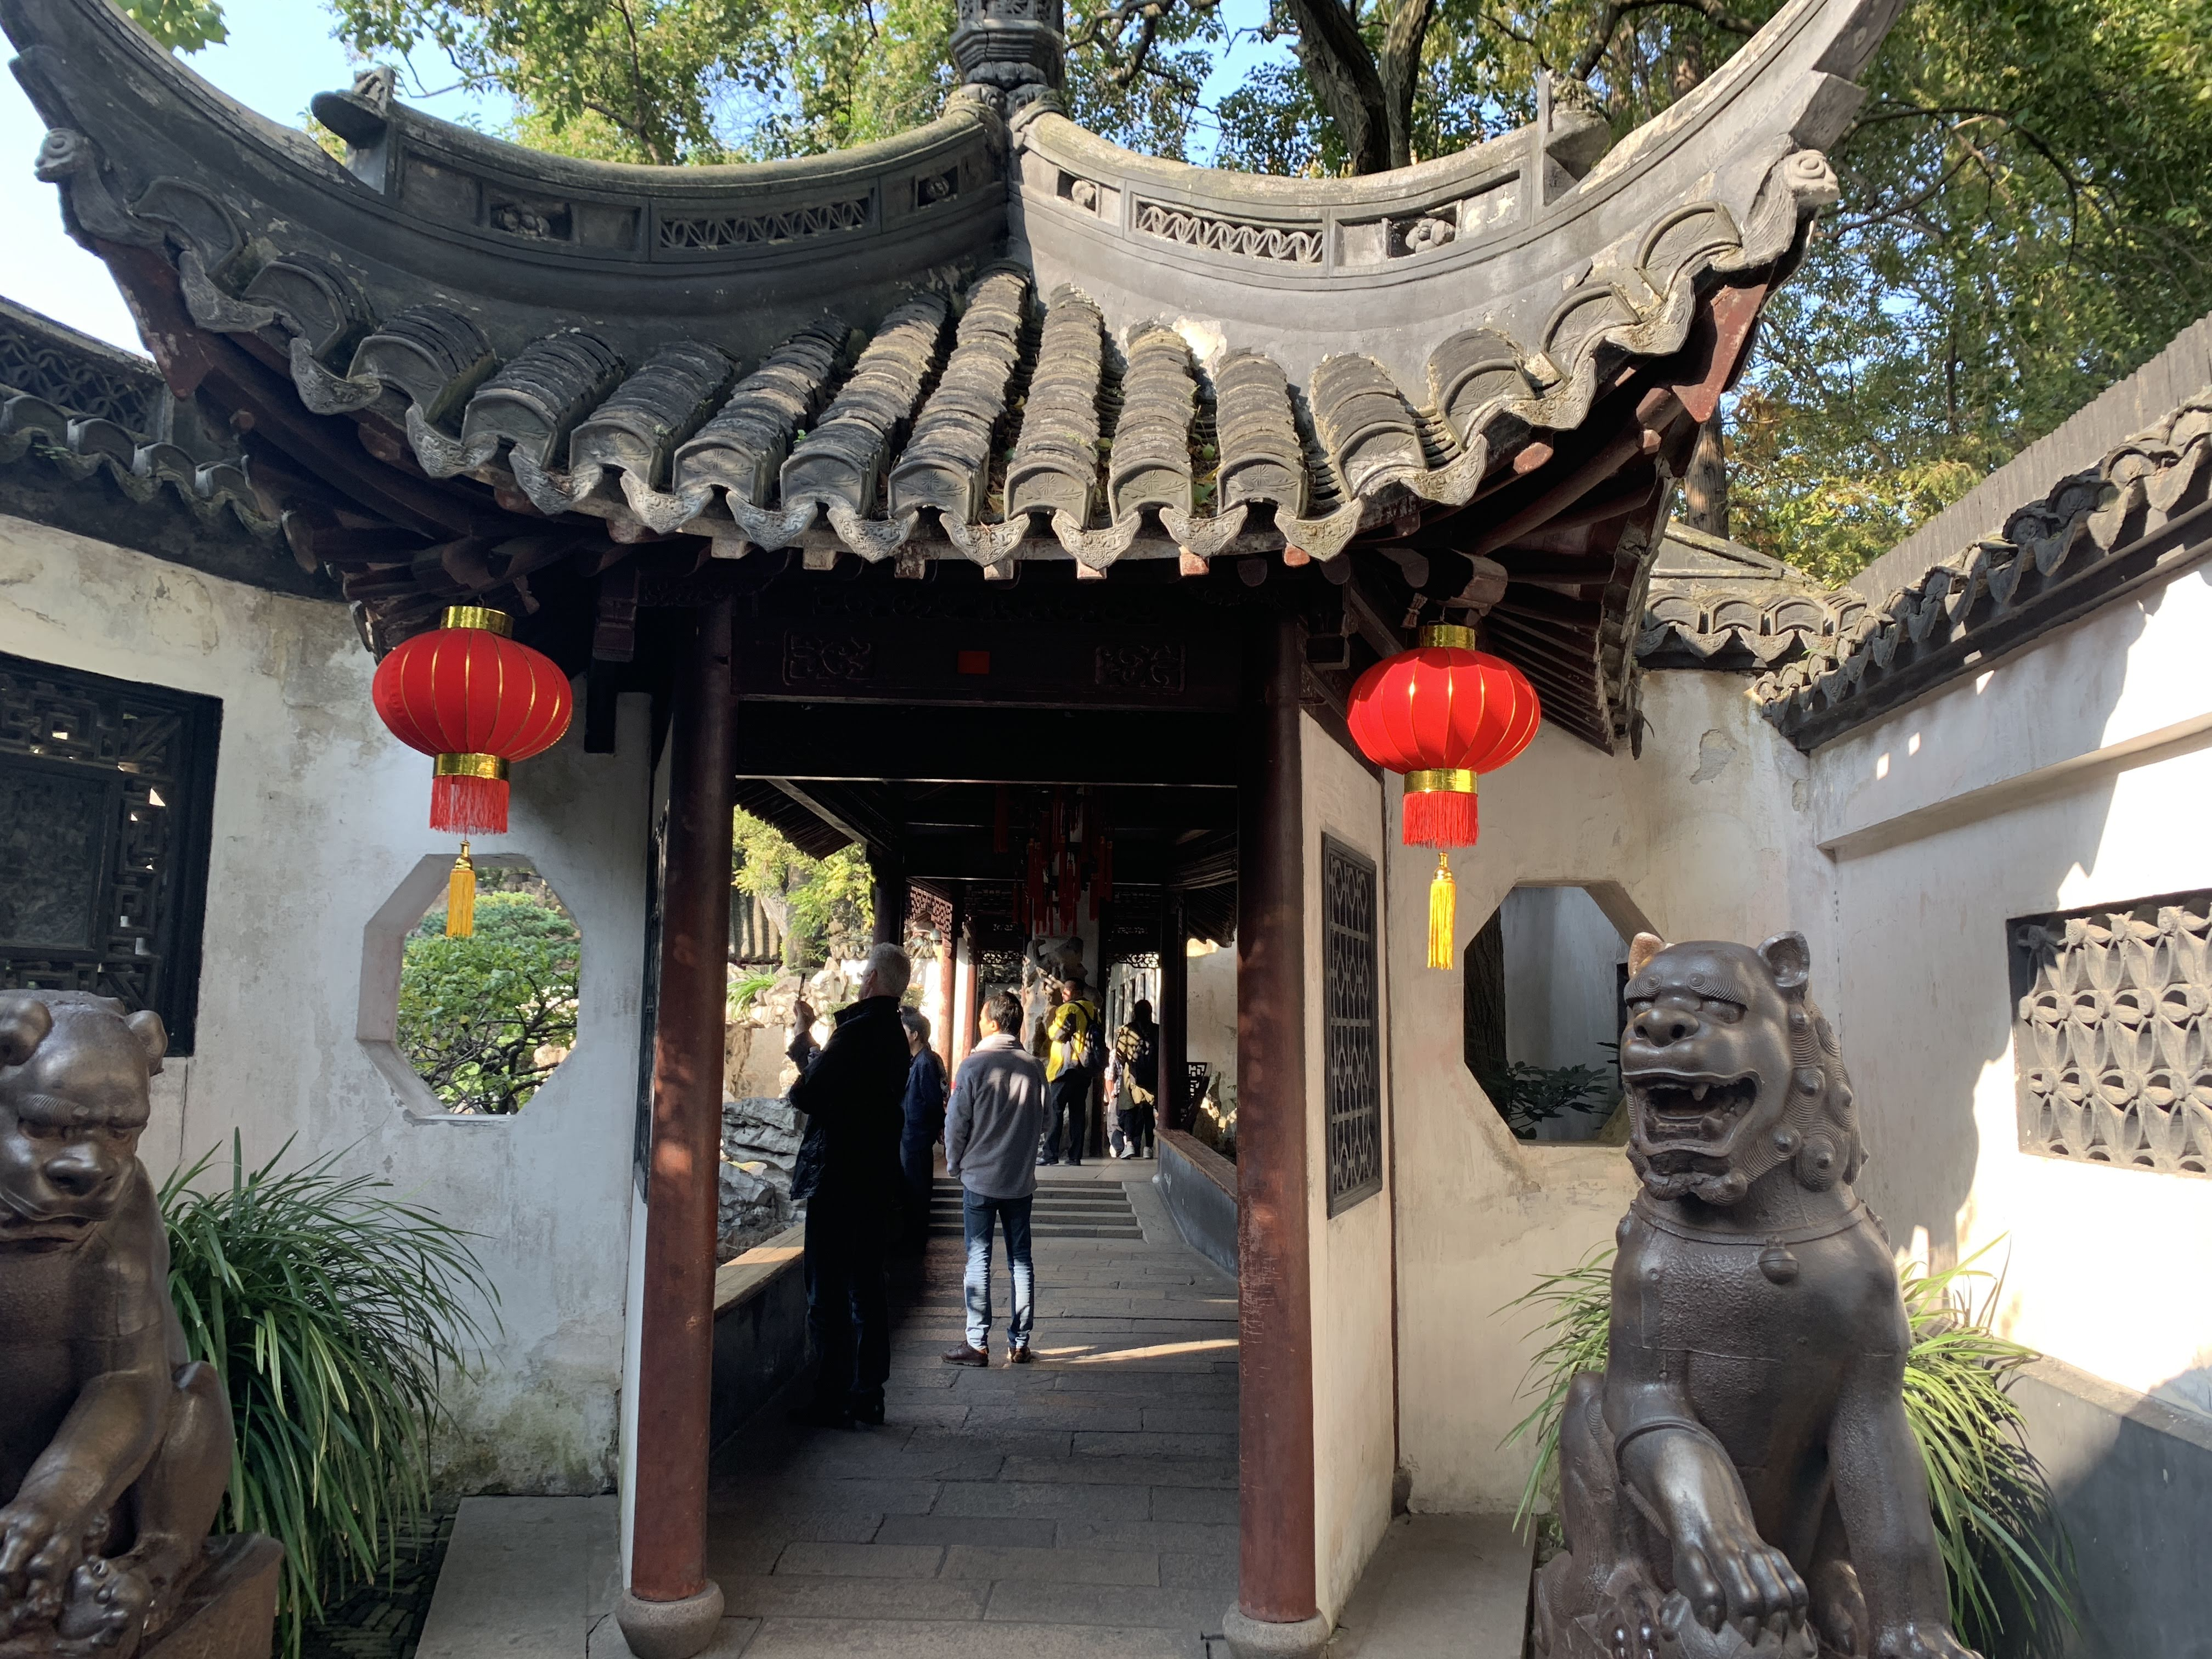 Entrance to Yu Gardens